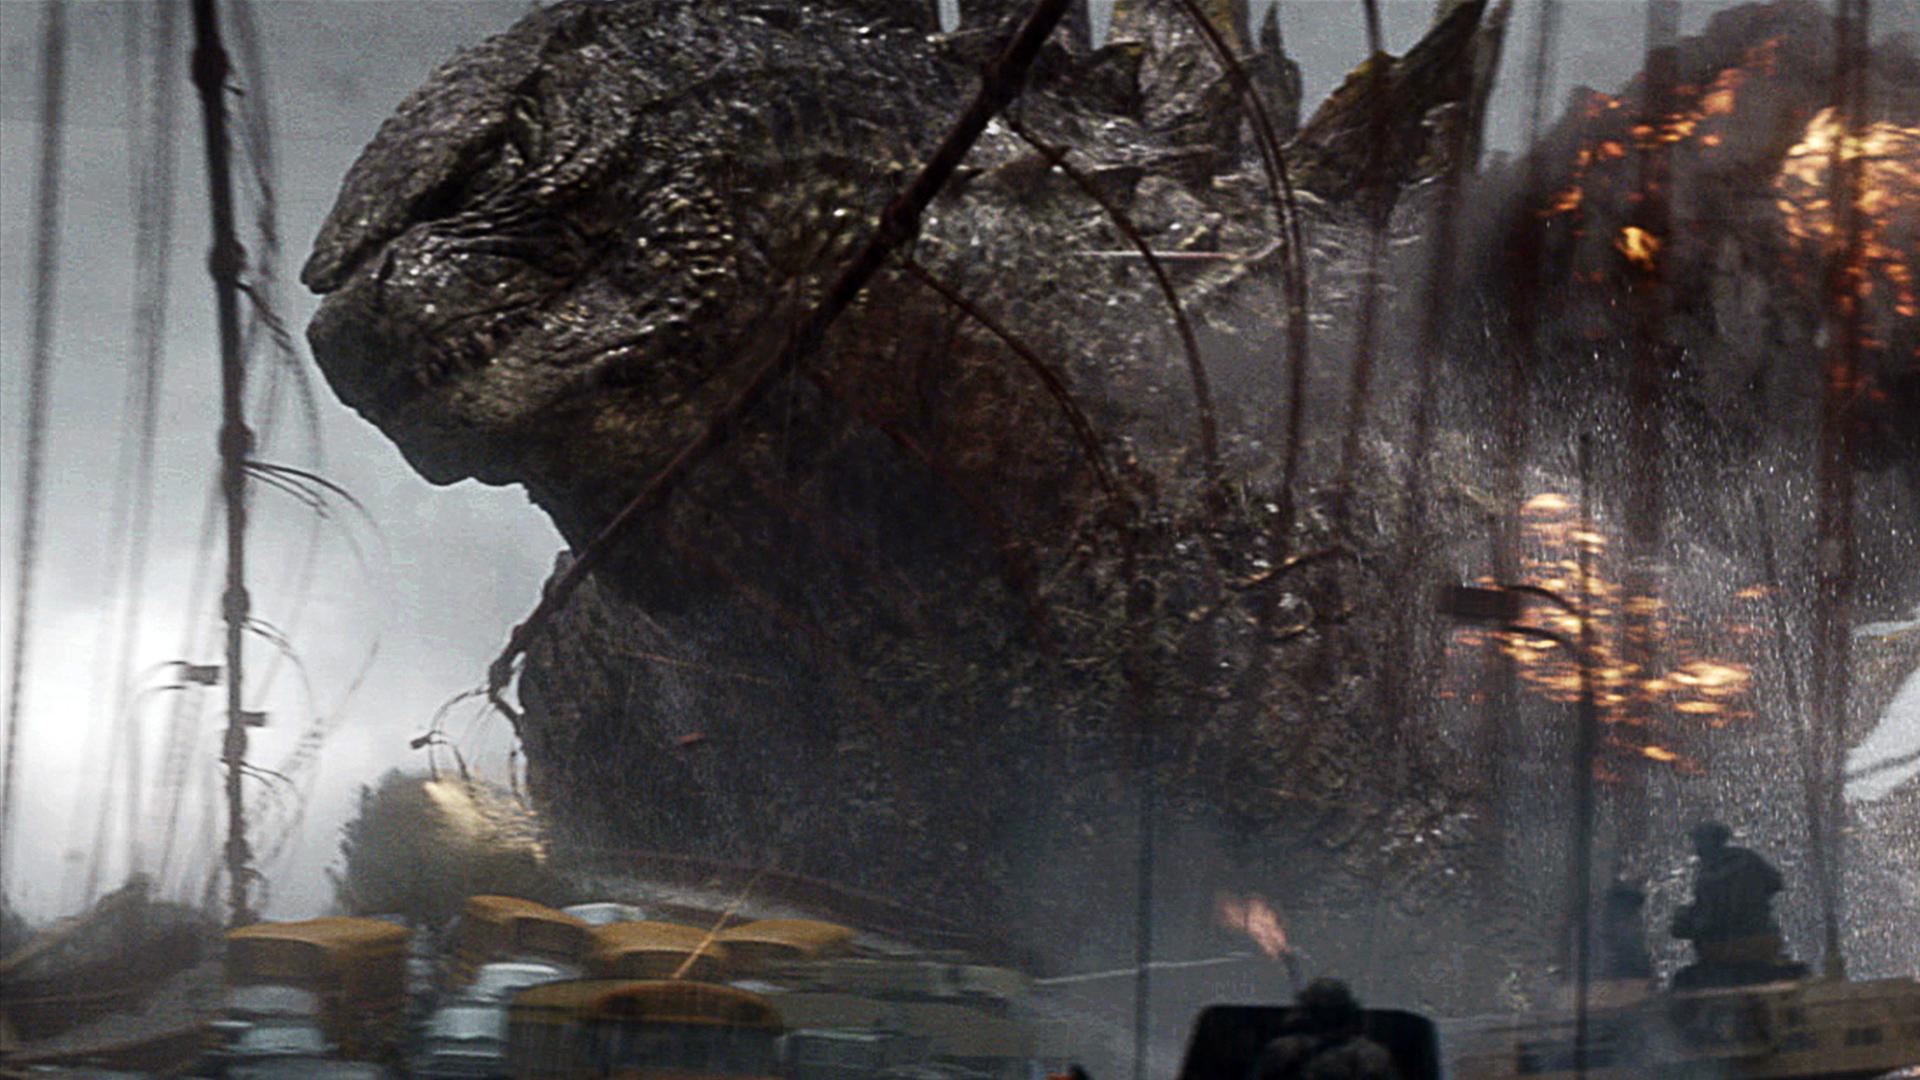 Godzilla Image 2014 02 Wallpaper HD 1920x1080